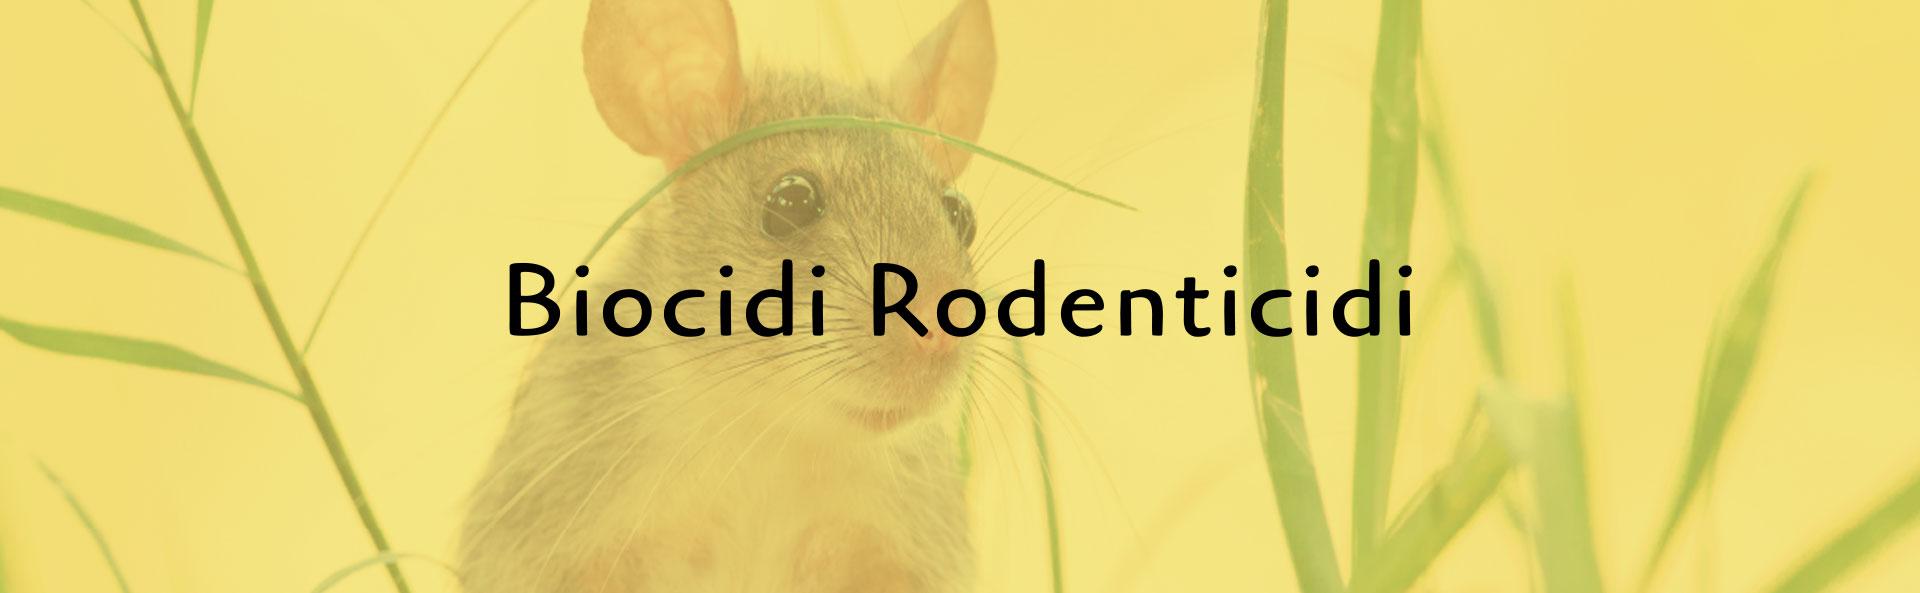 SEPRAN_biocidi_header